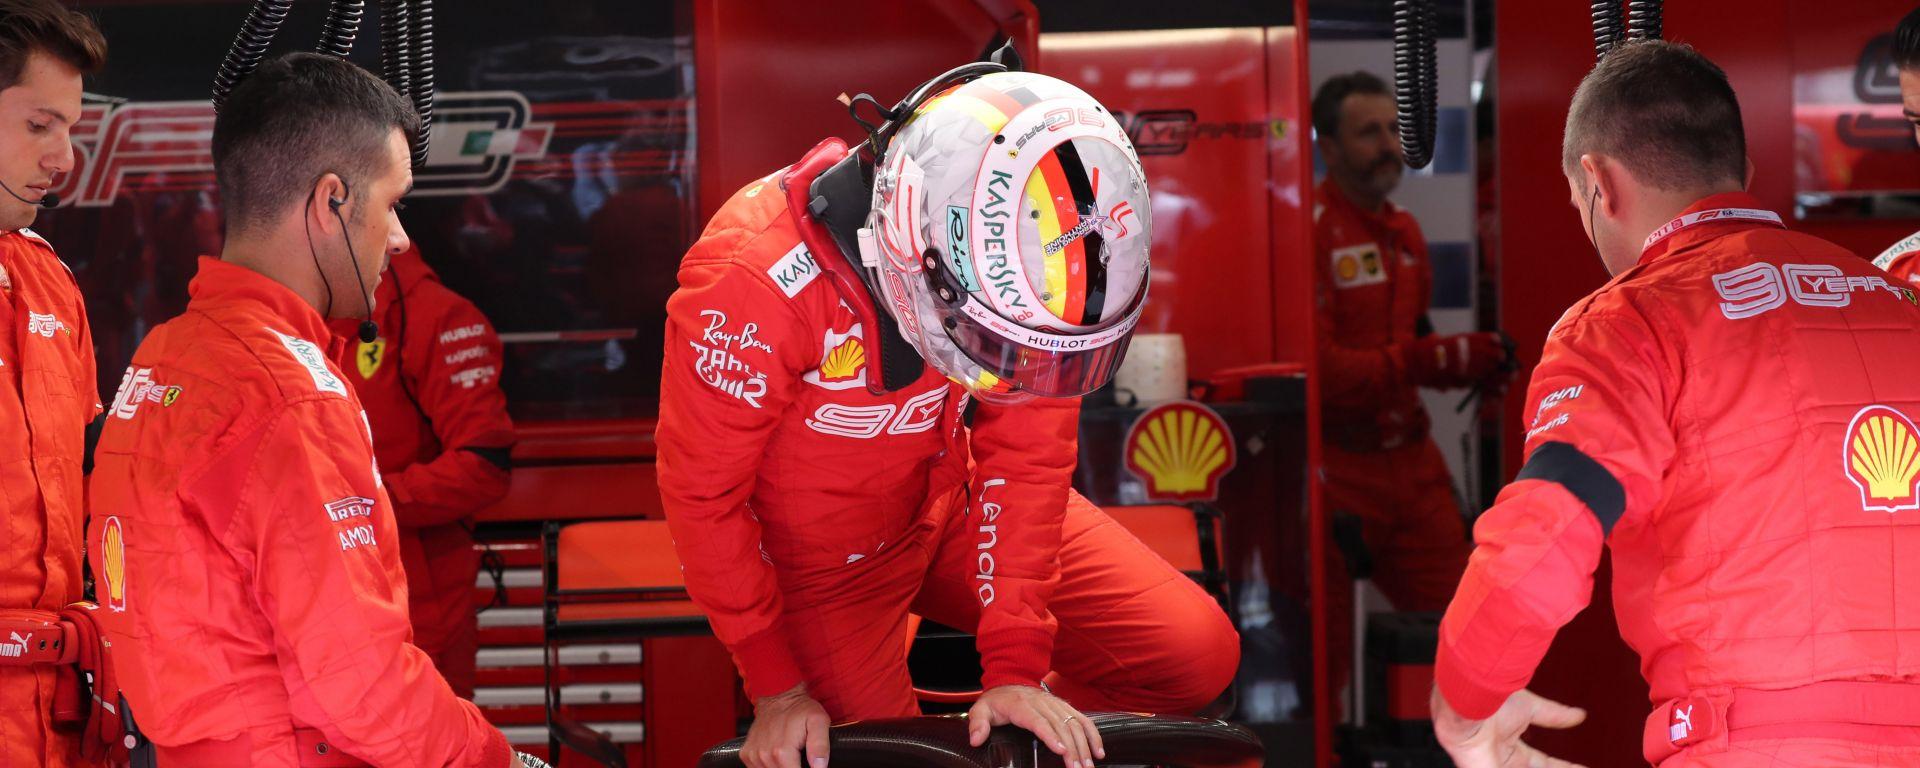 F1 GP Belgio 2019, Spa Francorchamps, Sebastian Vettel (Ferrari)